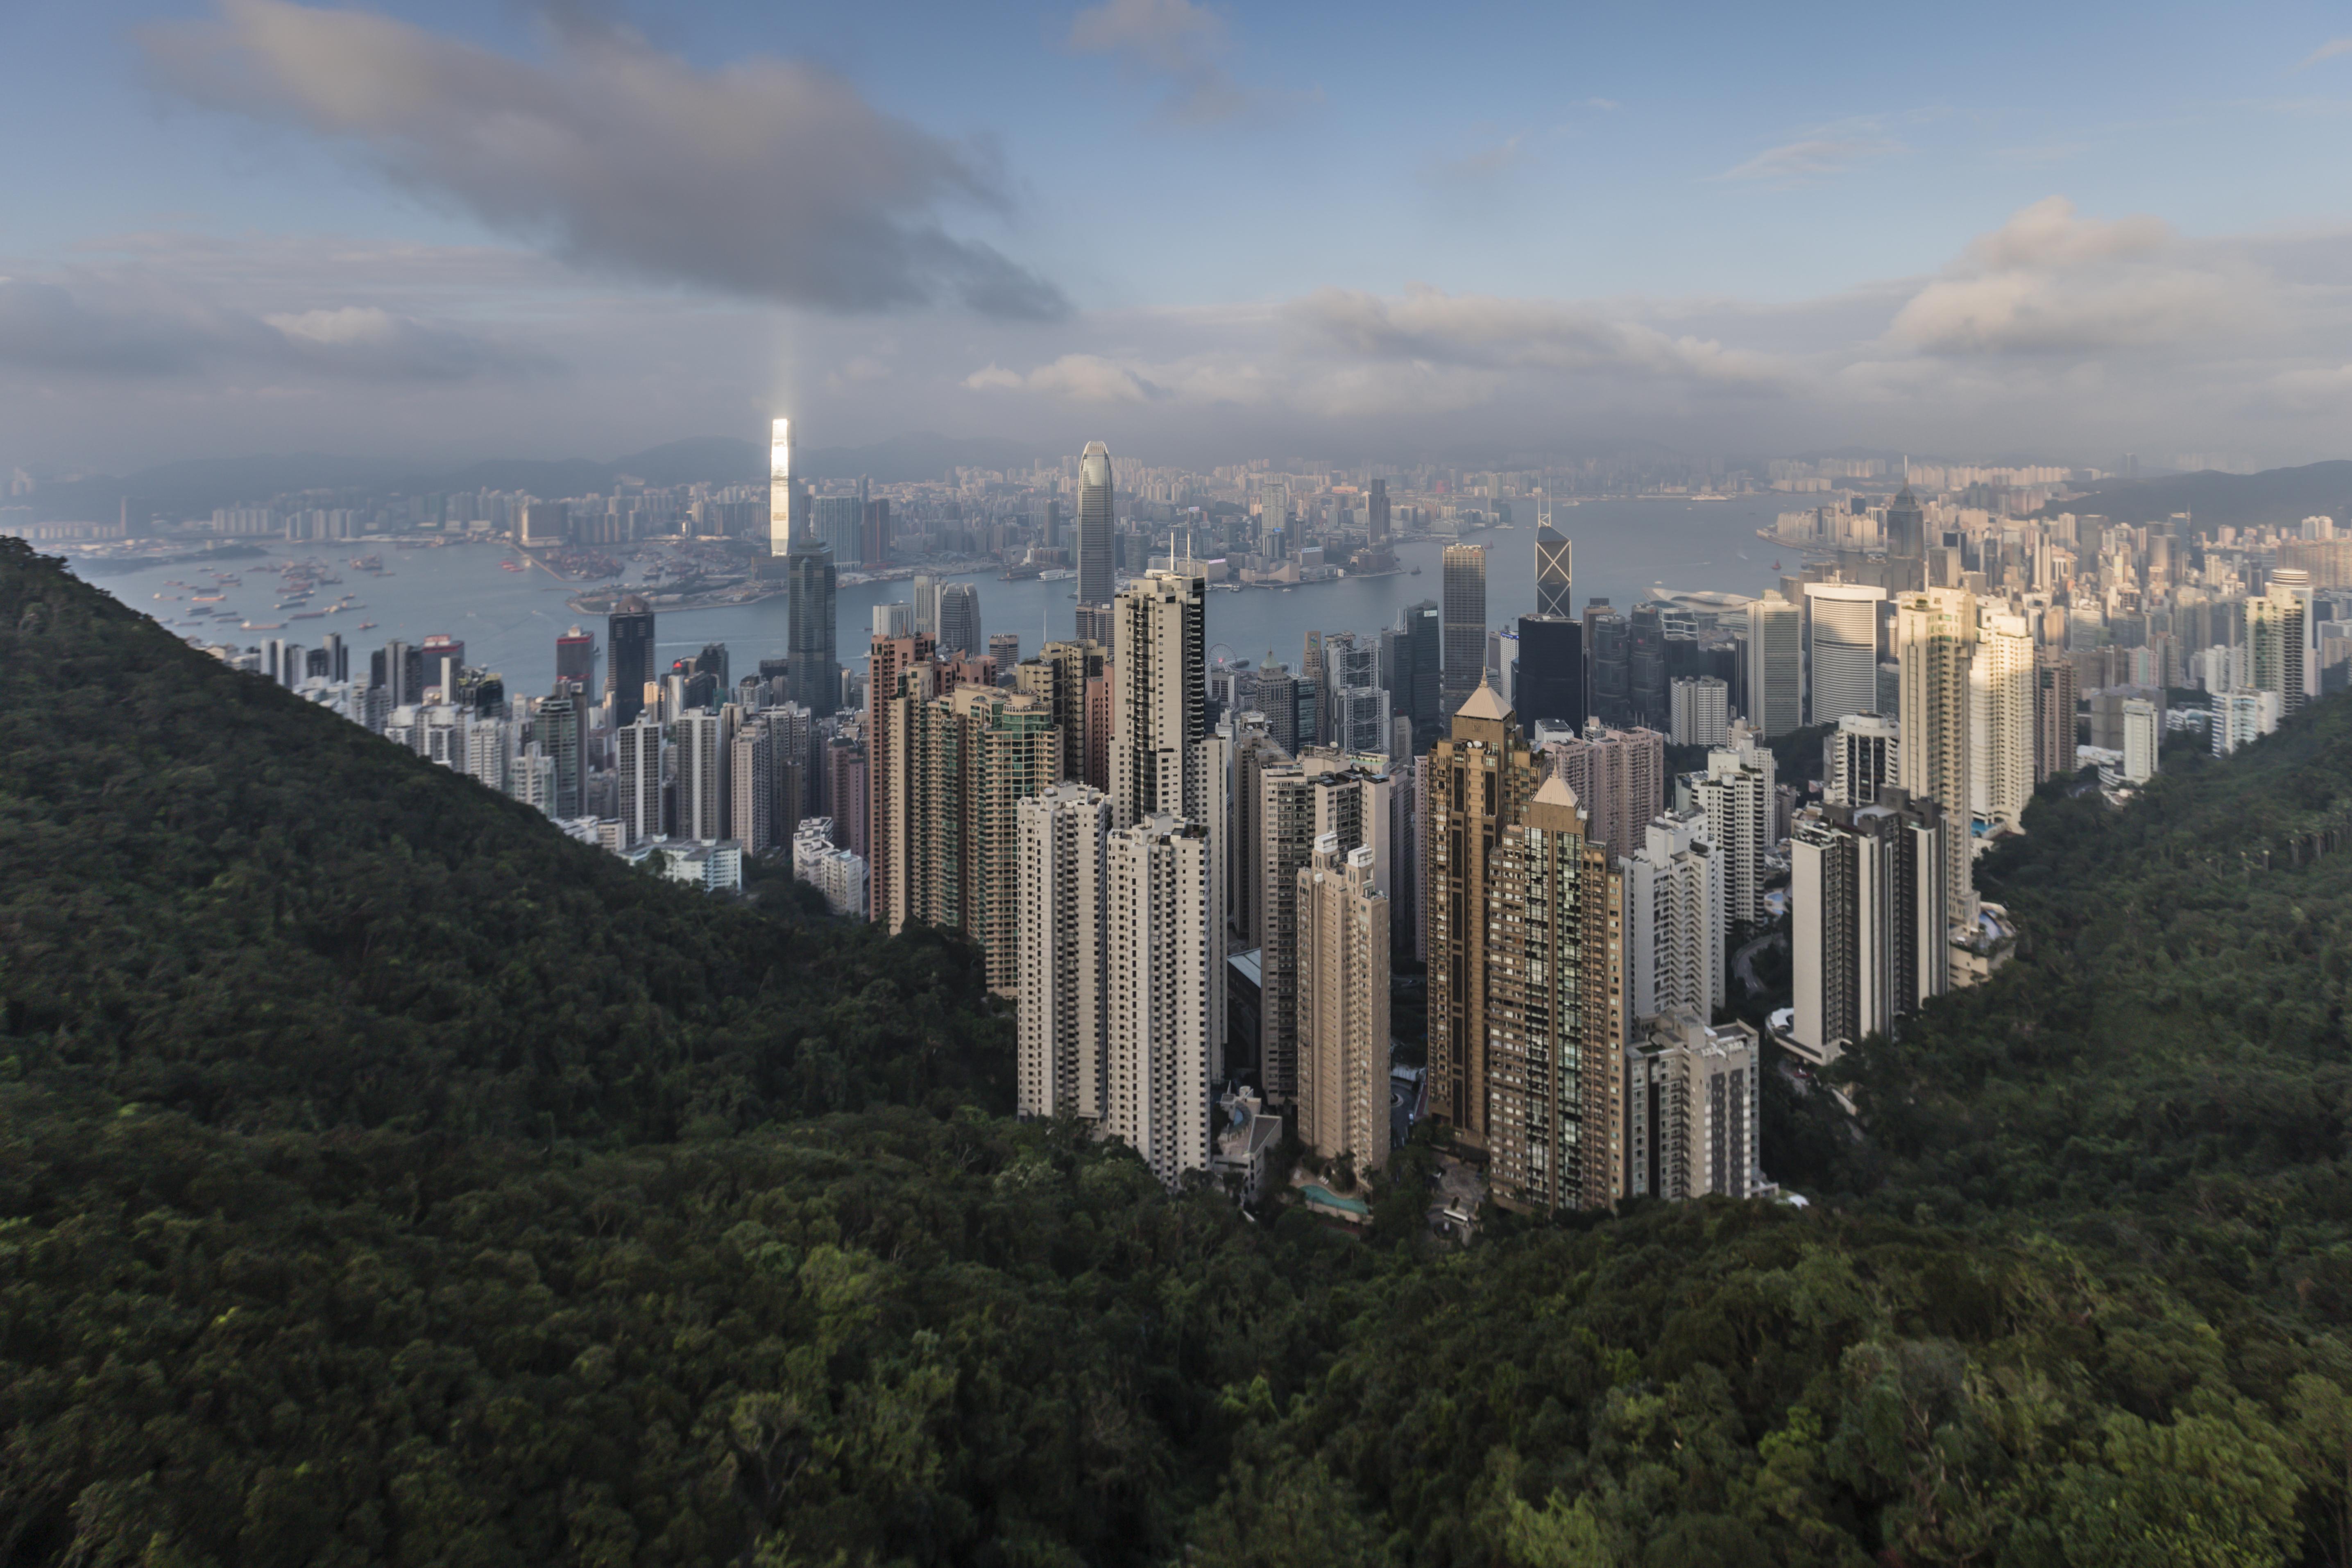 2018 - Victoria Peak, Hong Kong